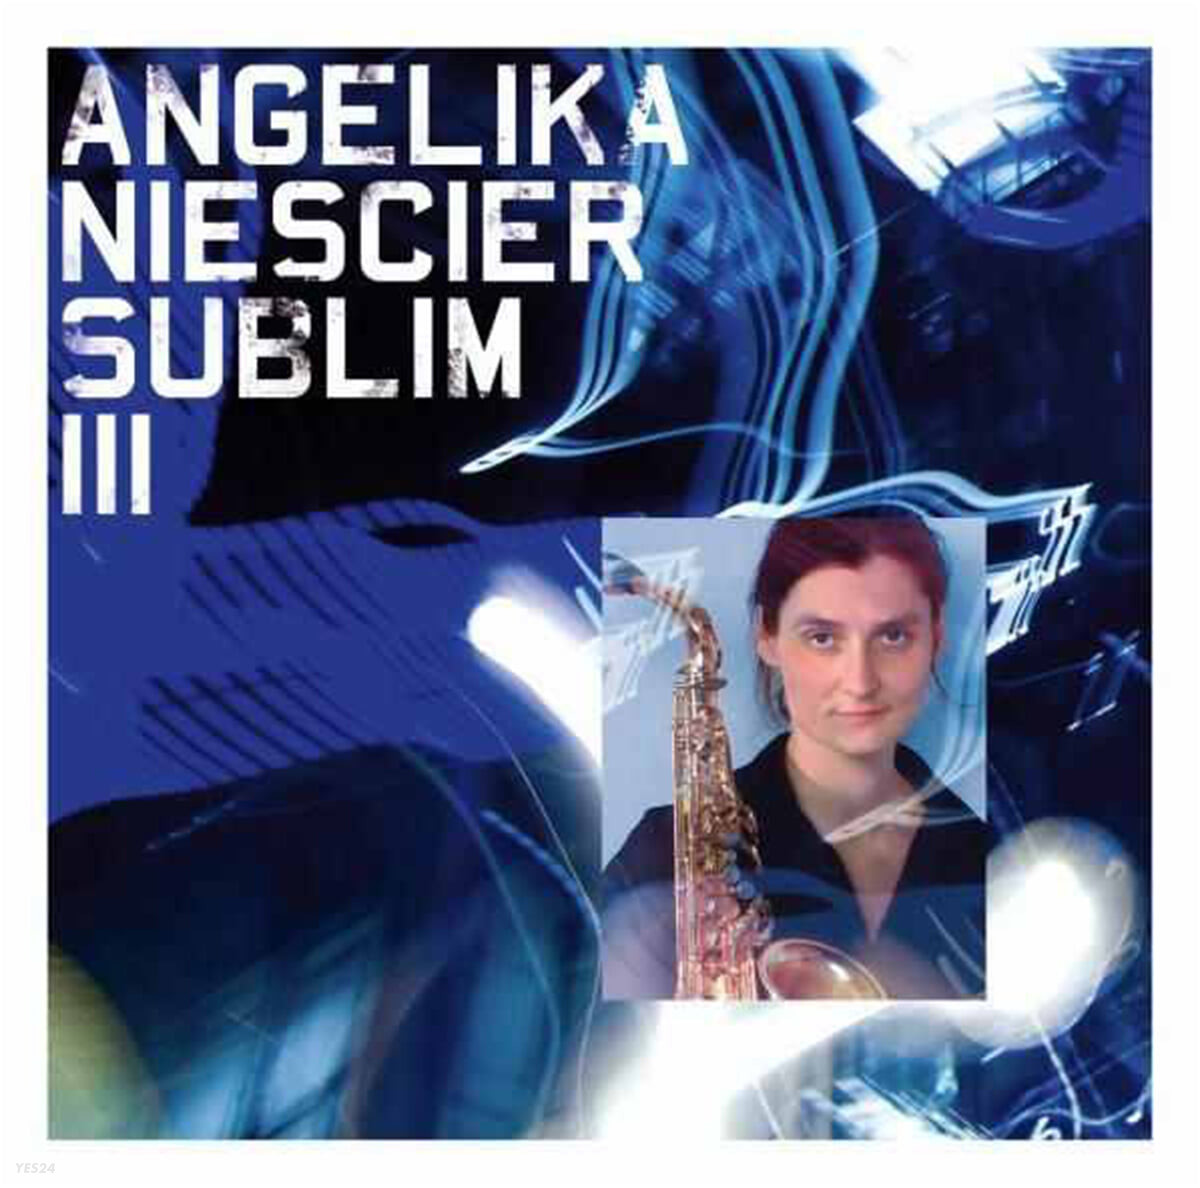 Angelika Niescier (앙겔리카 니에샤이어) - Sublim III